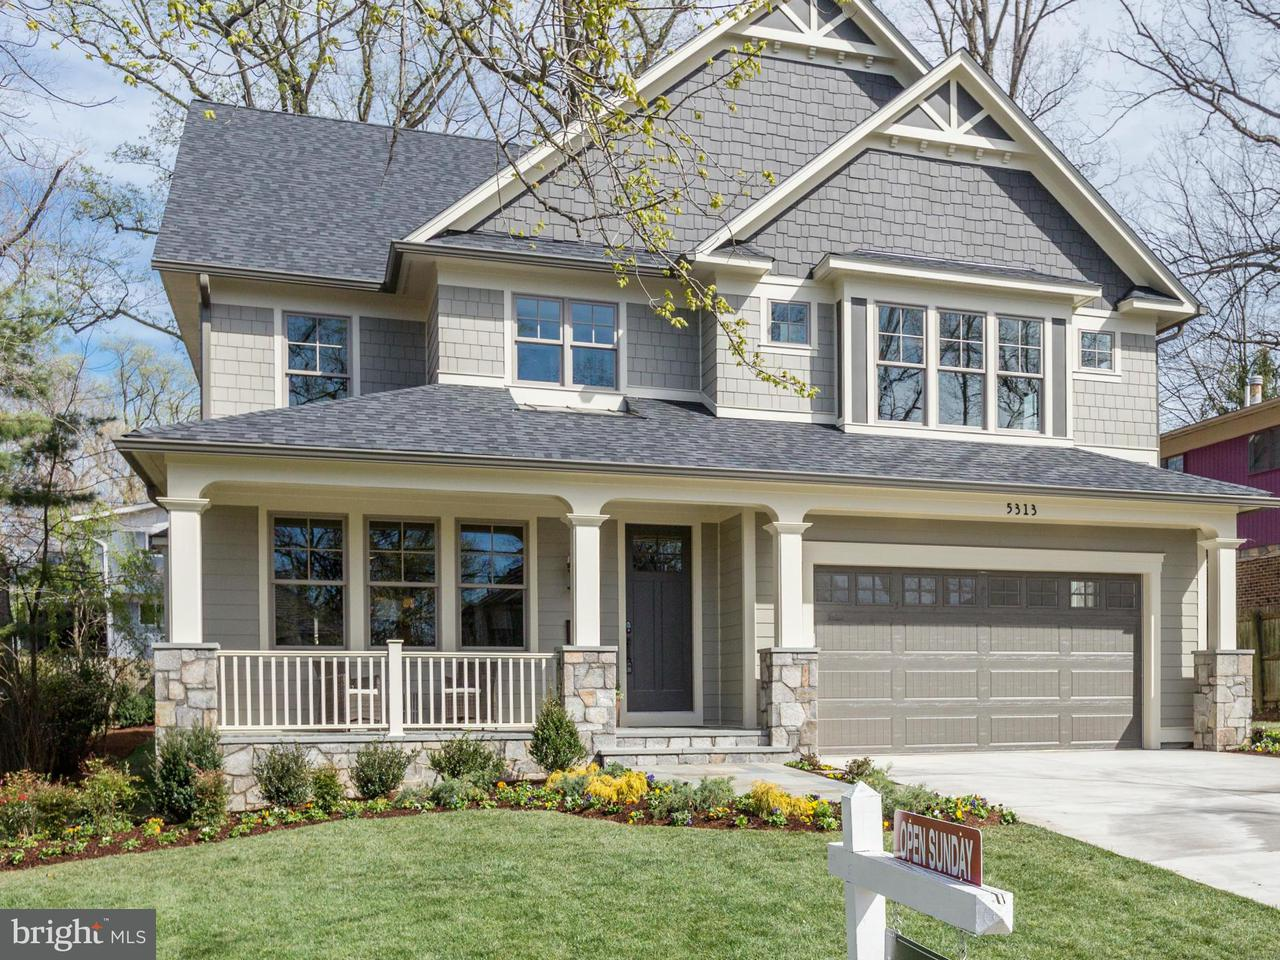 Maison unifamiliale pour l Vente à 5313 WAPAKONETA Road 5313 WAPAKONETA Road Bethesda, Maryland 20816 États-Unis